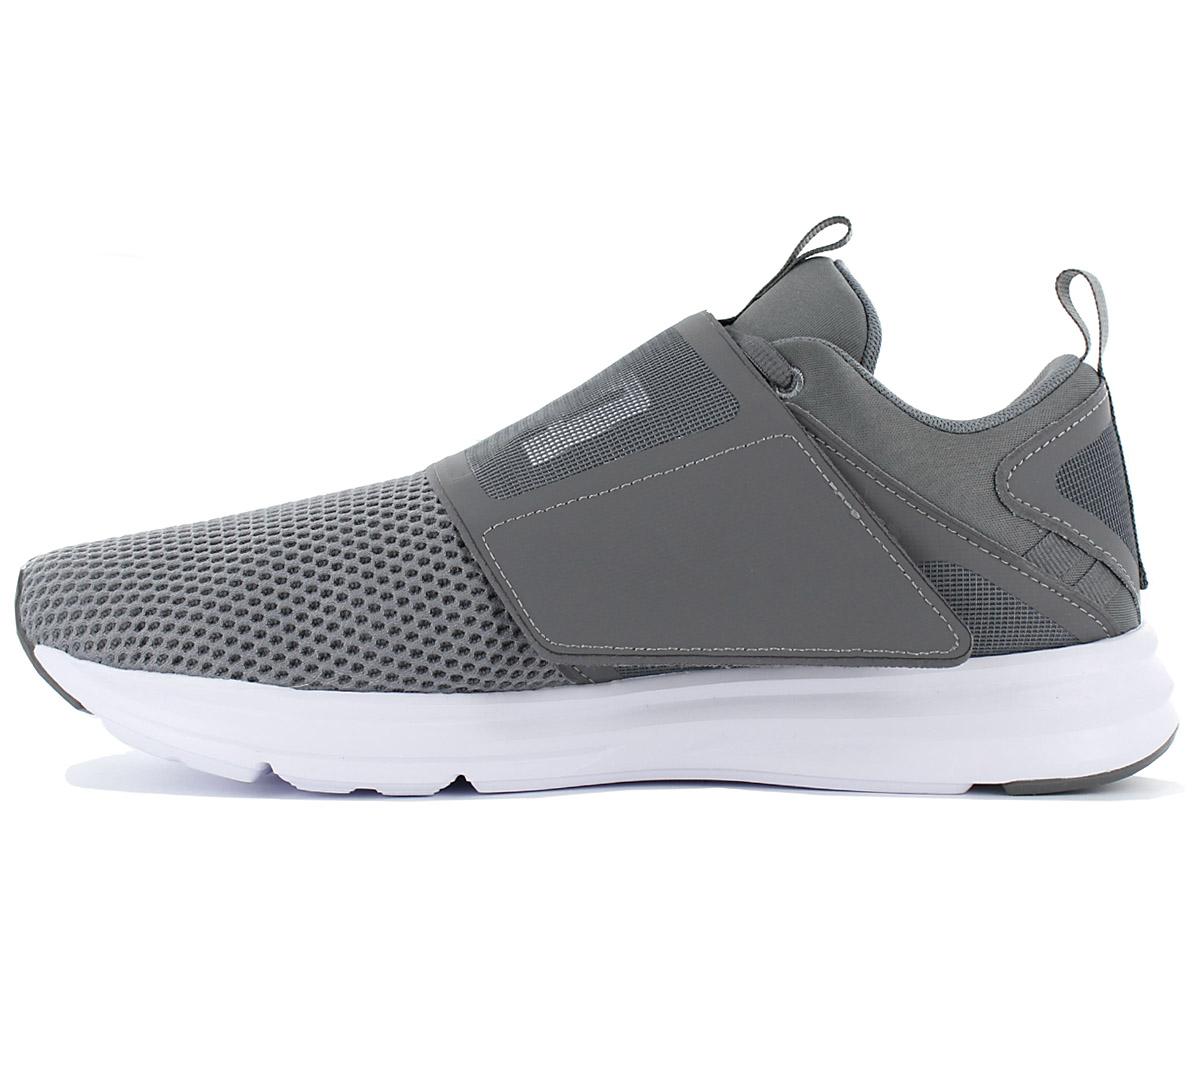 best sneakers d7307 4fd06 Puma Enzo Strap Schuhe Herren Sneaker Grau Turnschuhe ...